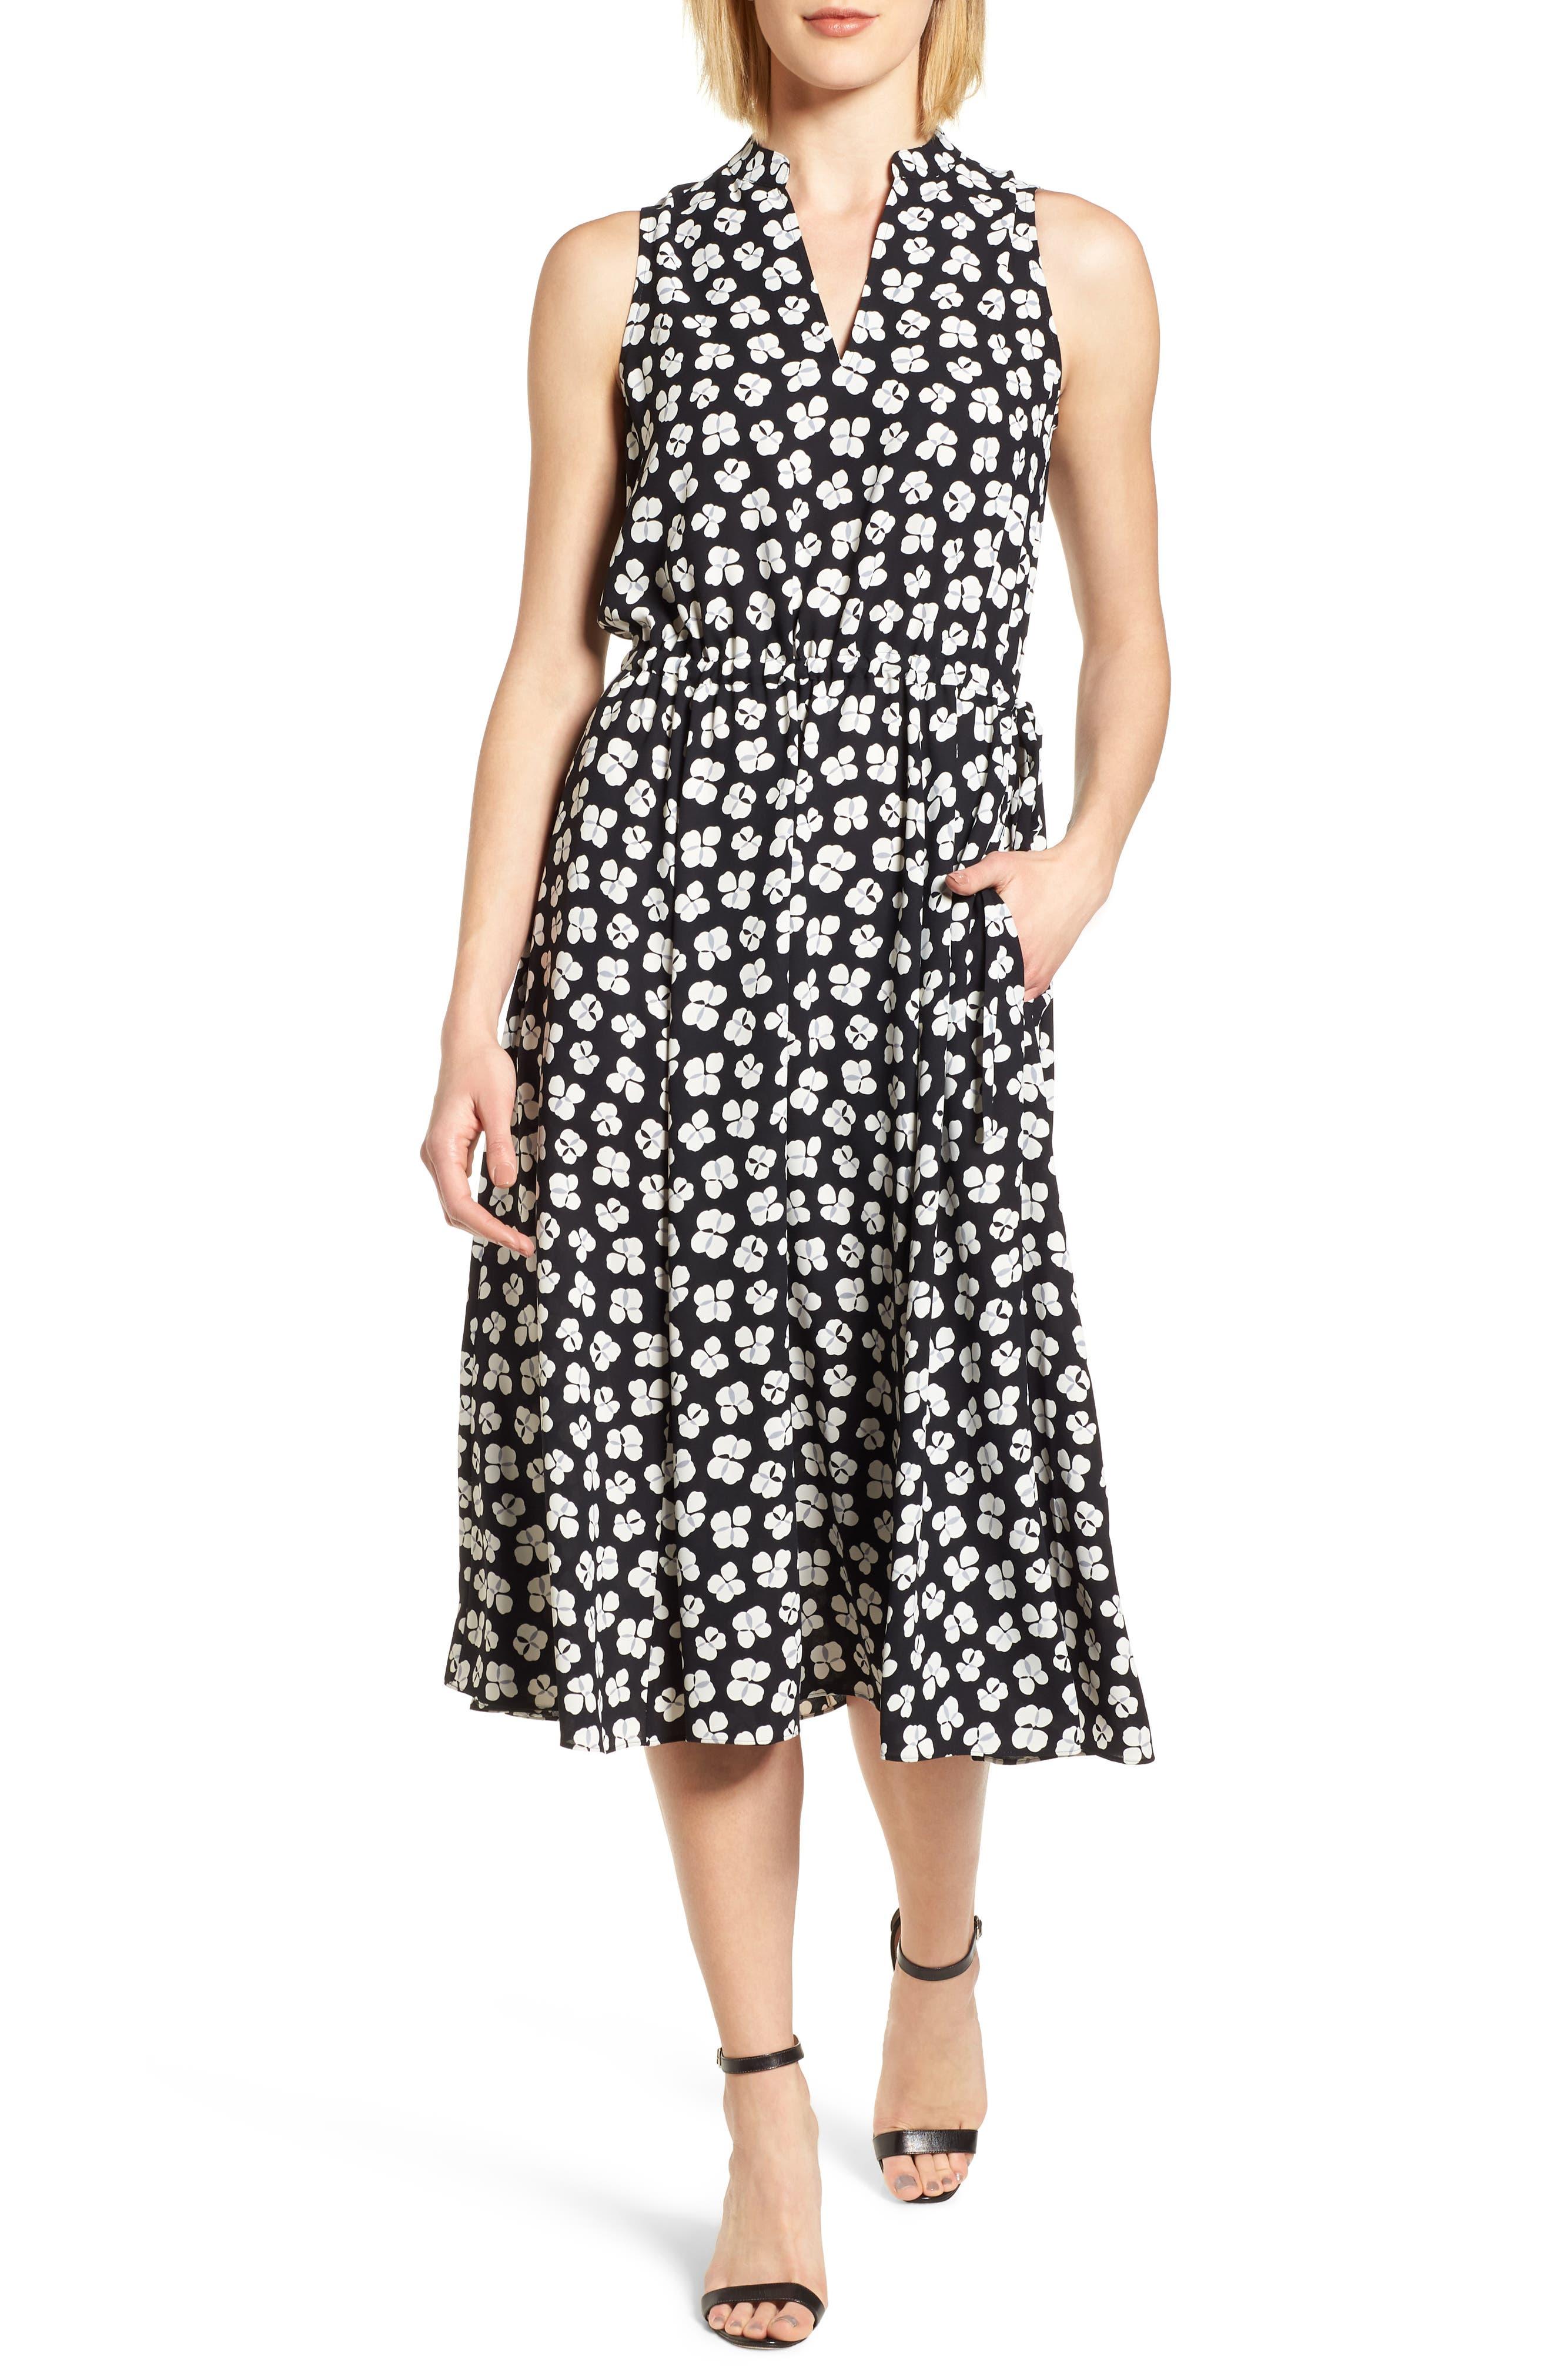 Zuma Petal Drawstring Midi Dress,                             Main thumbnail 1, color,                             001